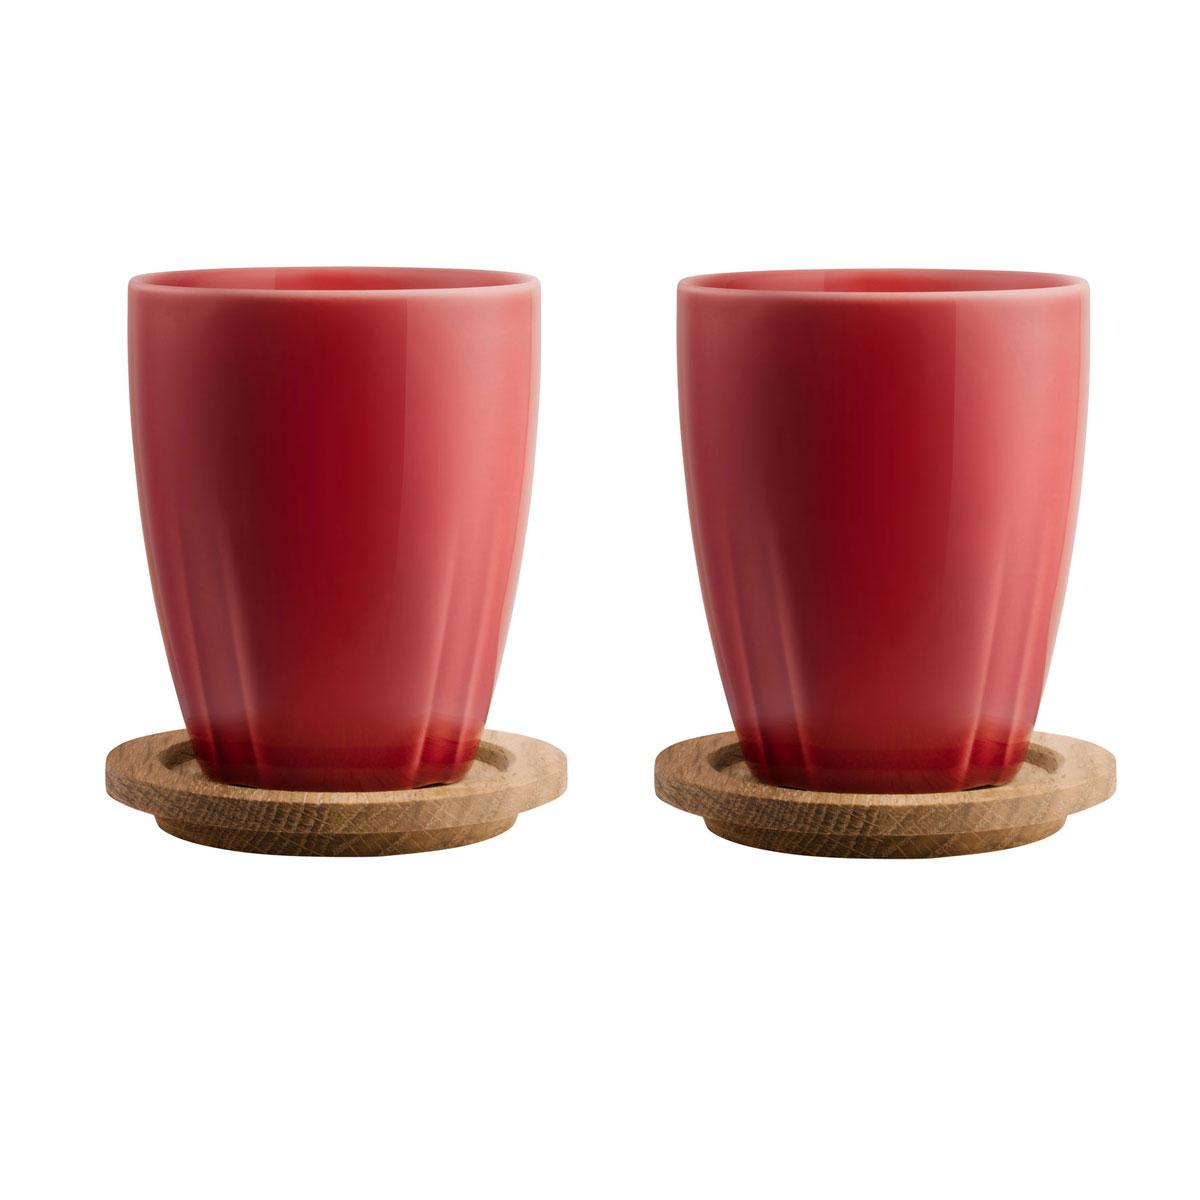 Kosta Boda Bruk Mug with Oak Lid, Set of 2, Bordeaux Red